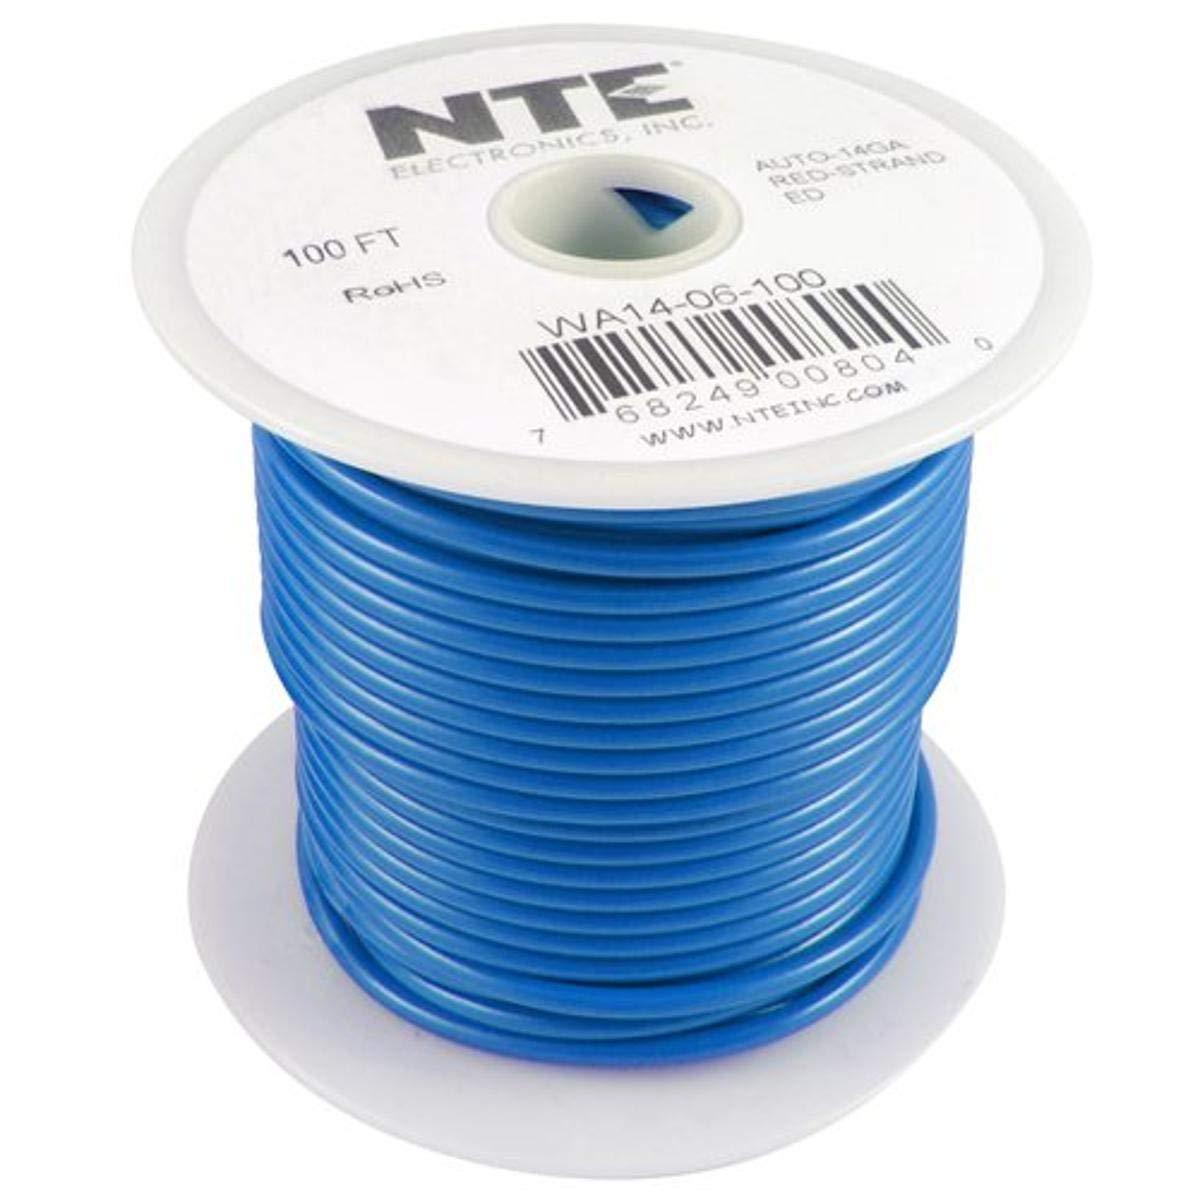 NTE Electronics WA14-06-20 Hook Up Wire Japan's Max 59% OFF largest assortment Automotive Type Gau 14